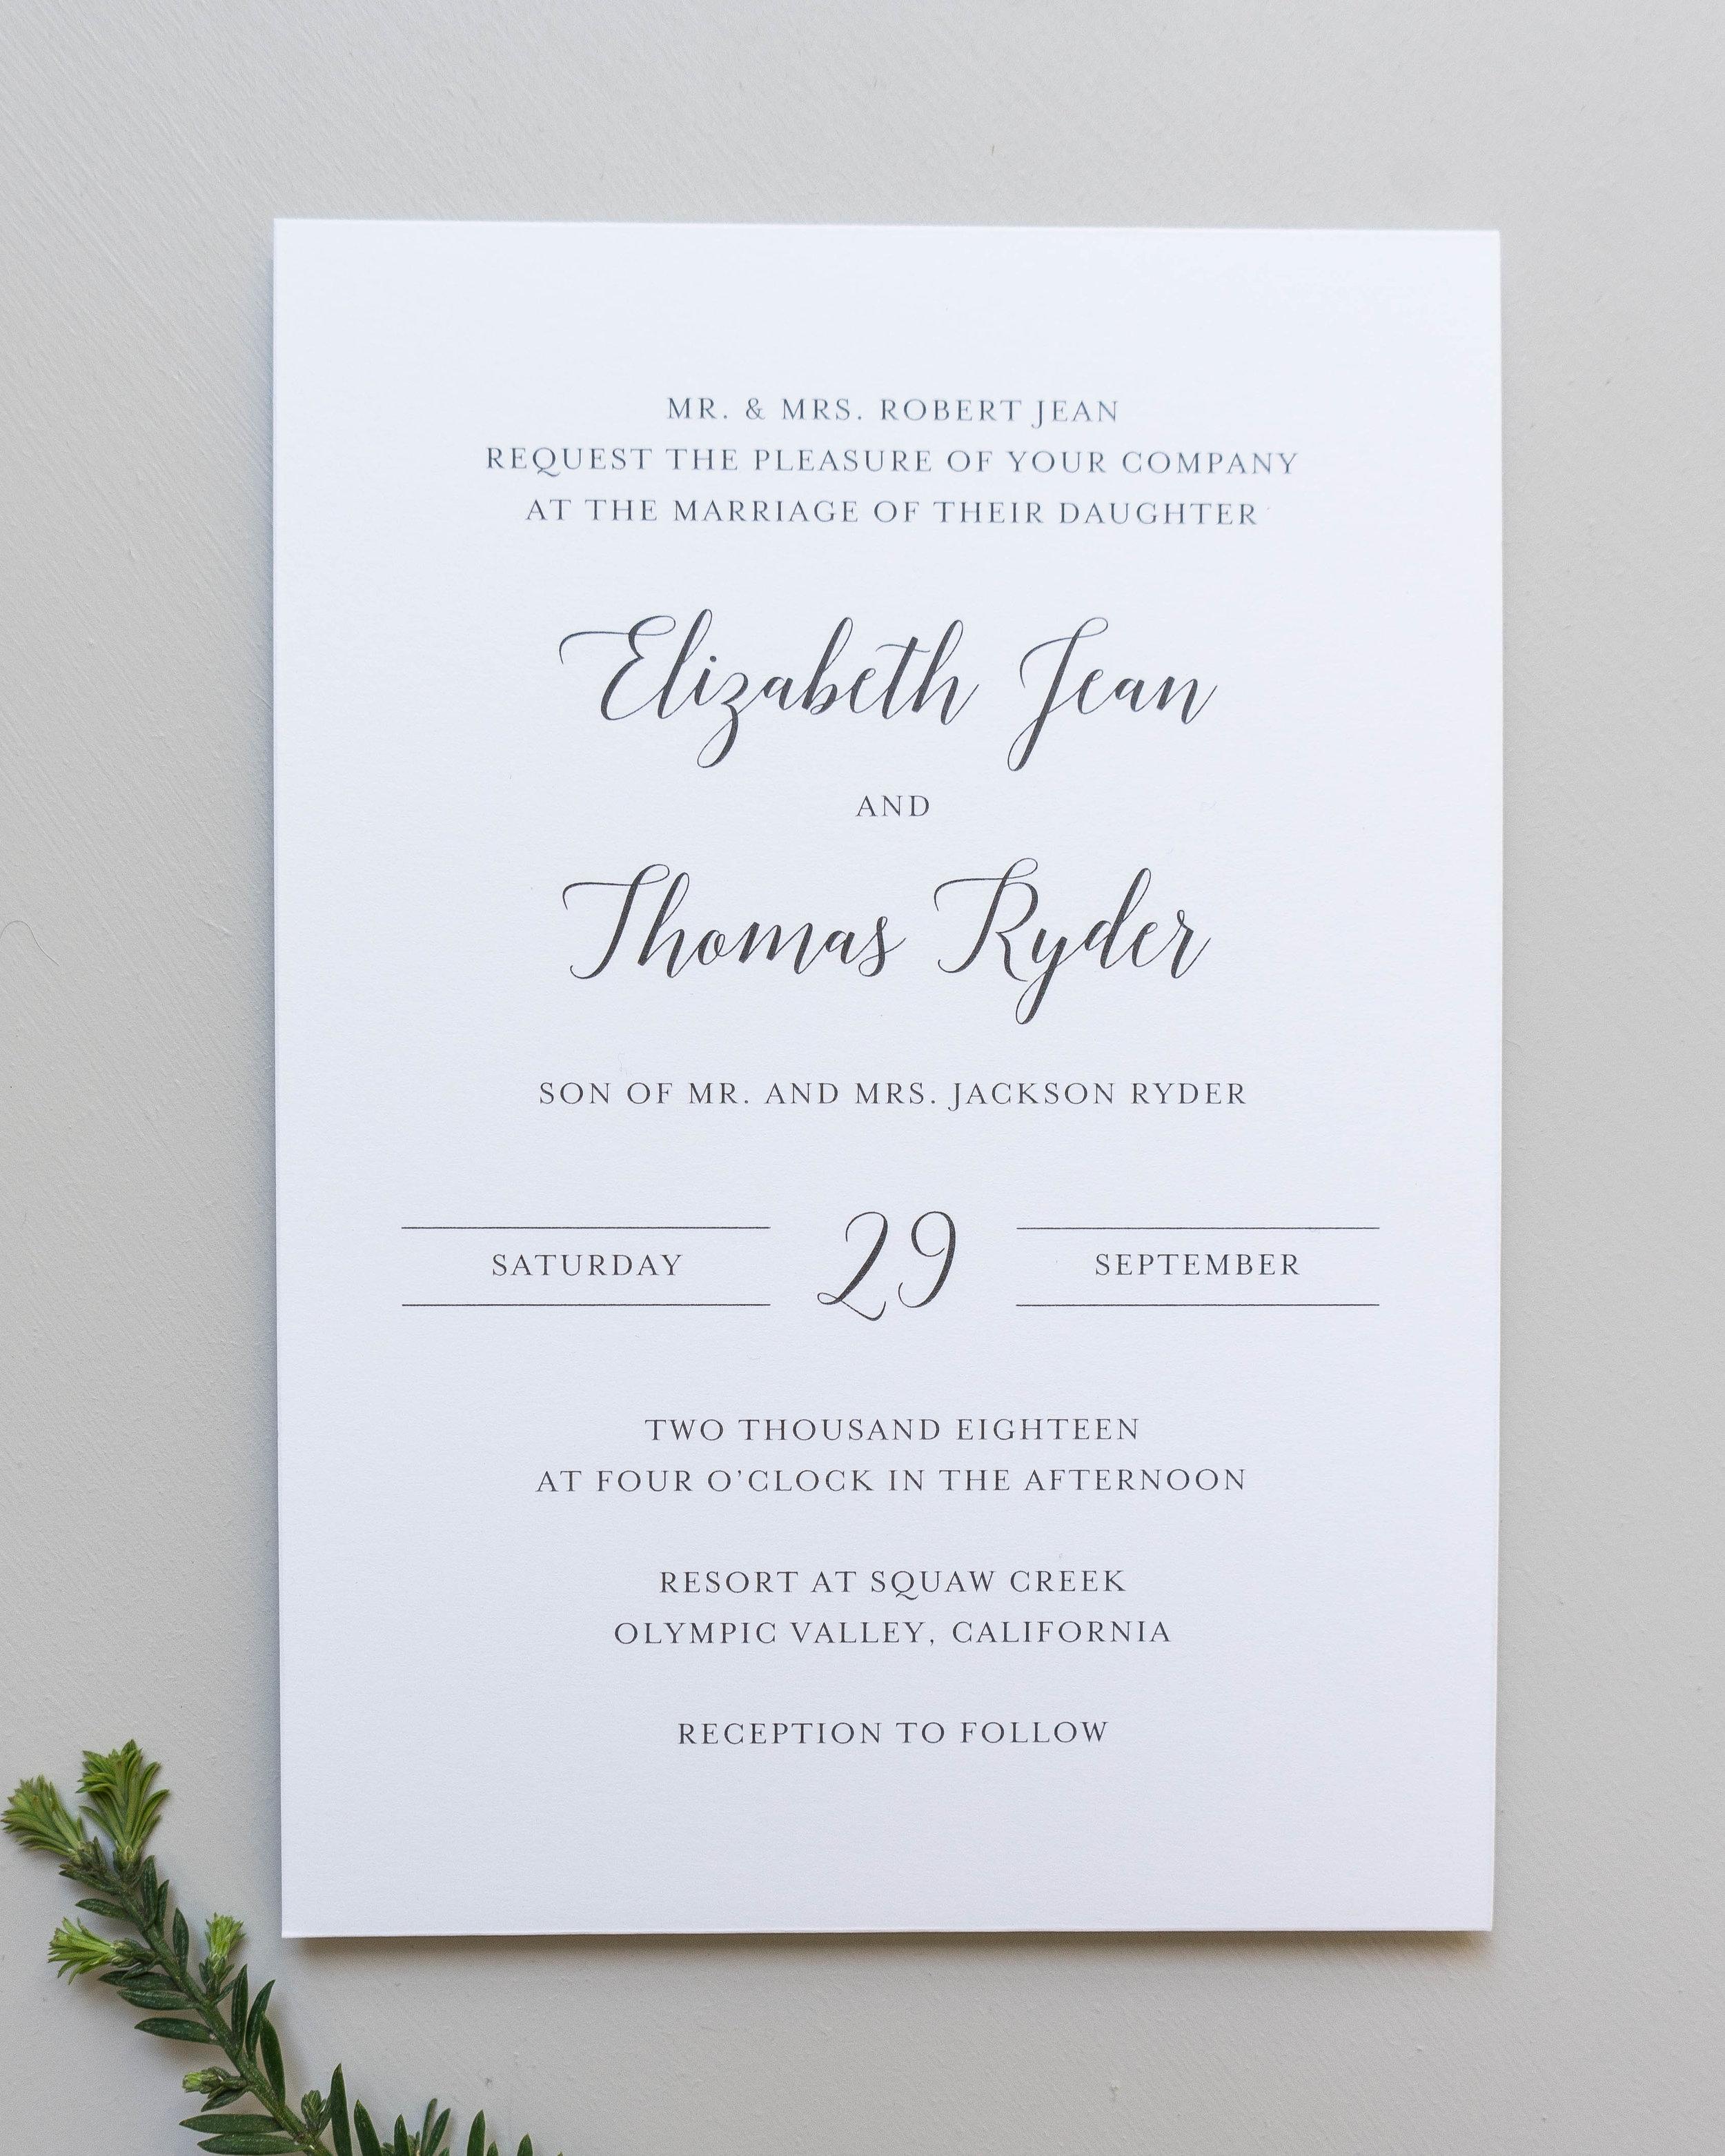 *Elegant Mountain Wedding Invitations by Just Jurf-7.jpg